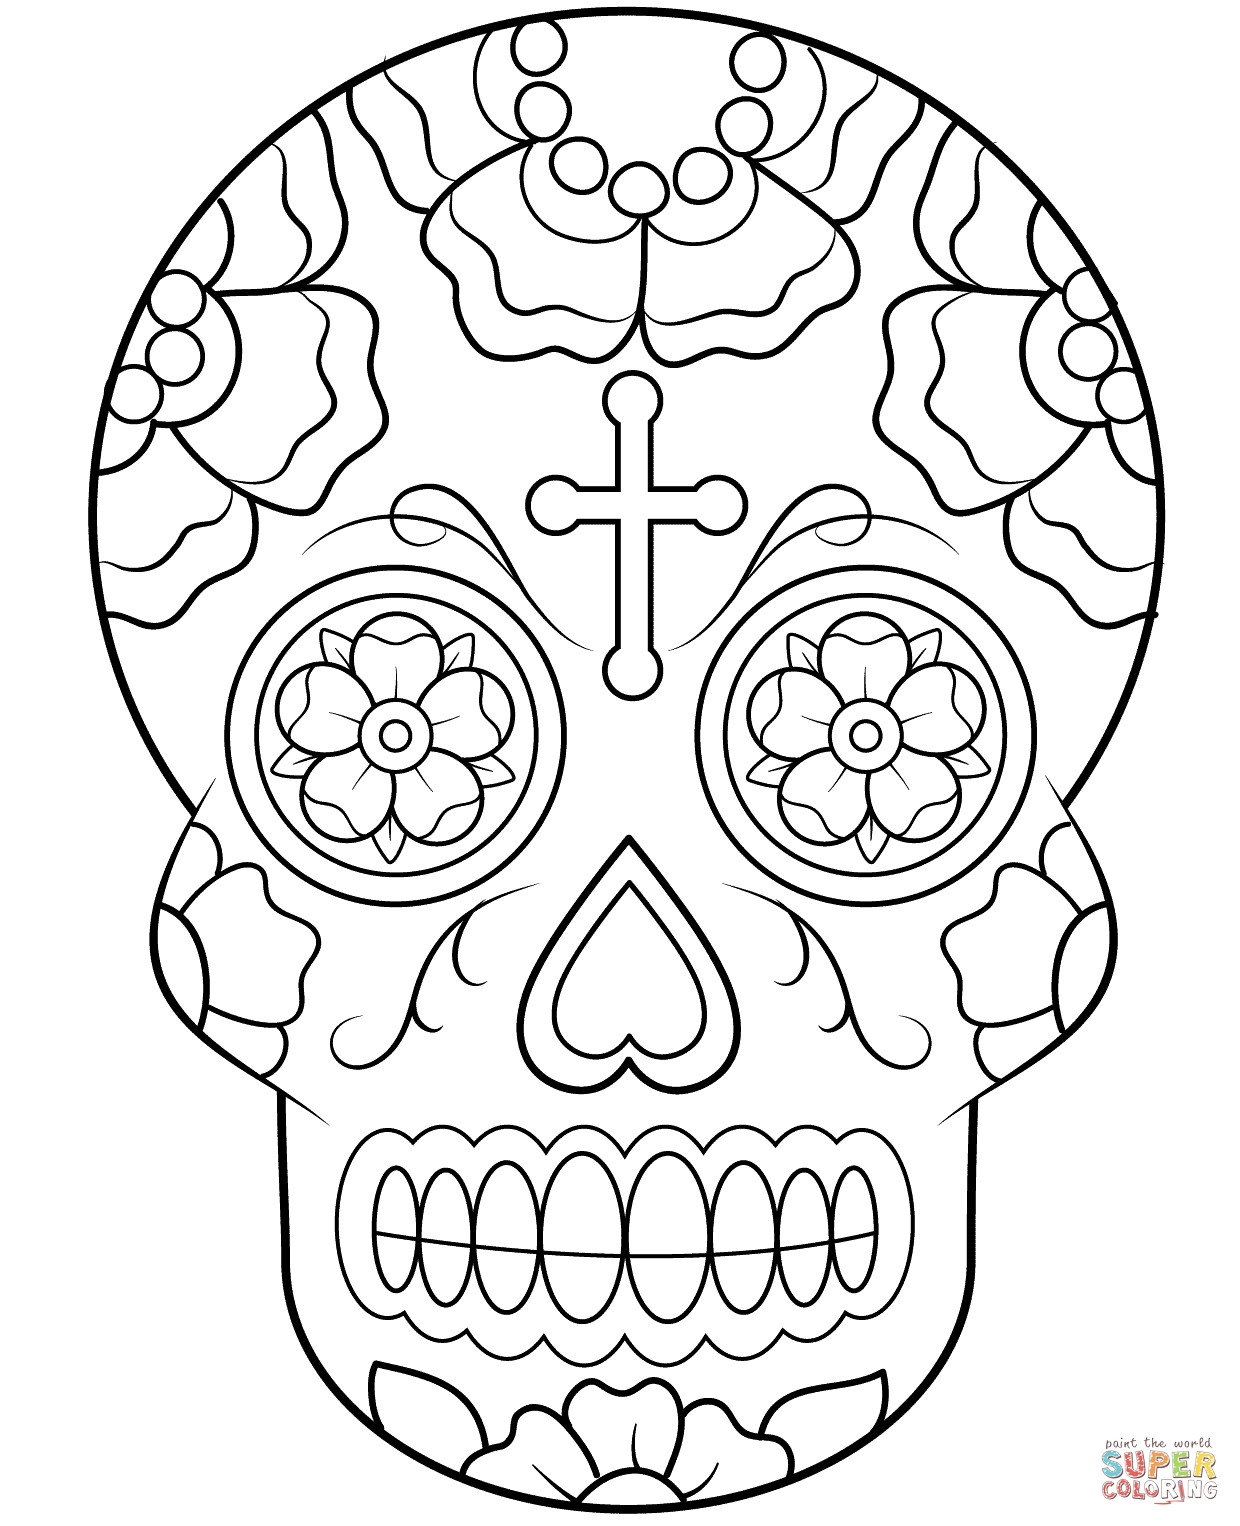 Sugar Skull Coloring Pages Printable Free at GetDrawings ...